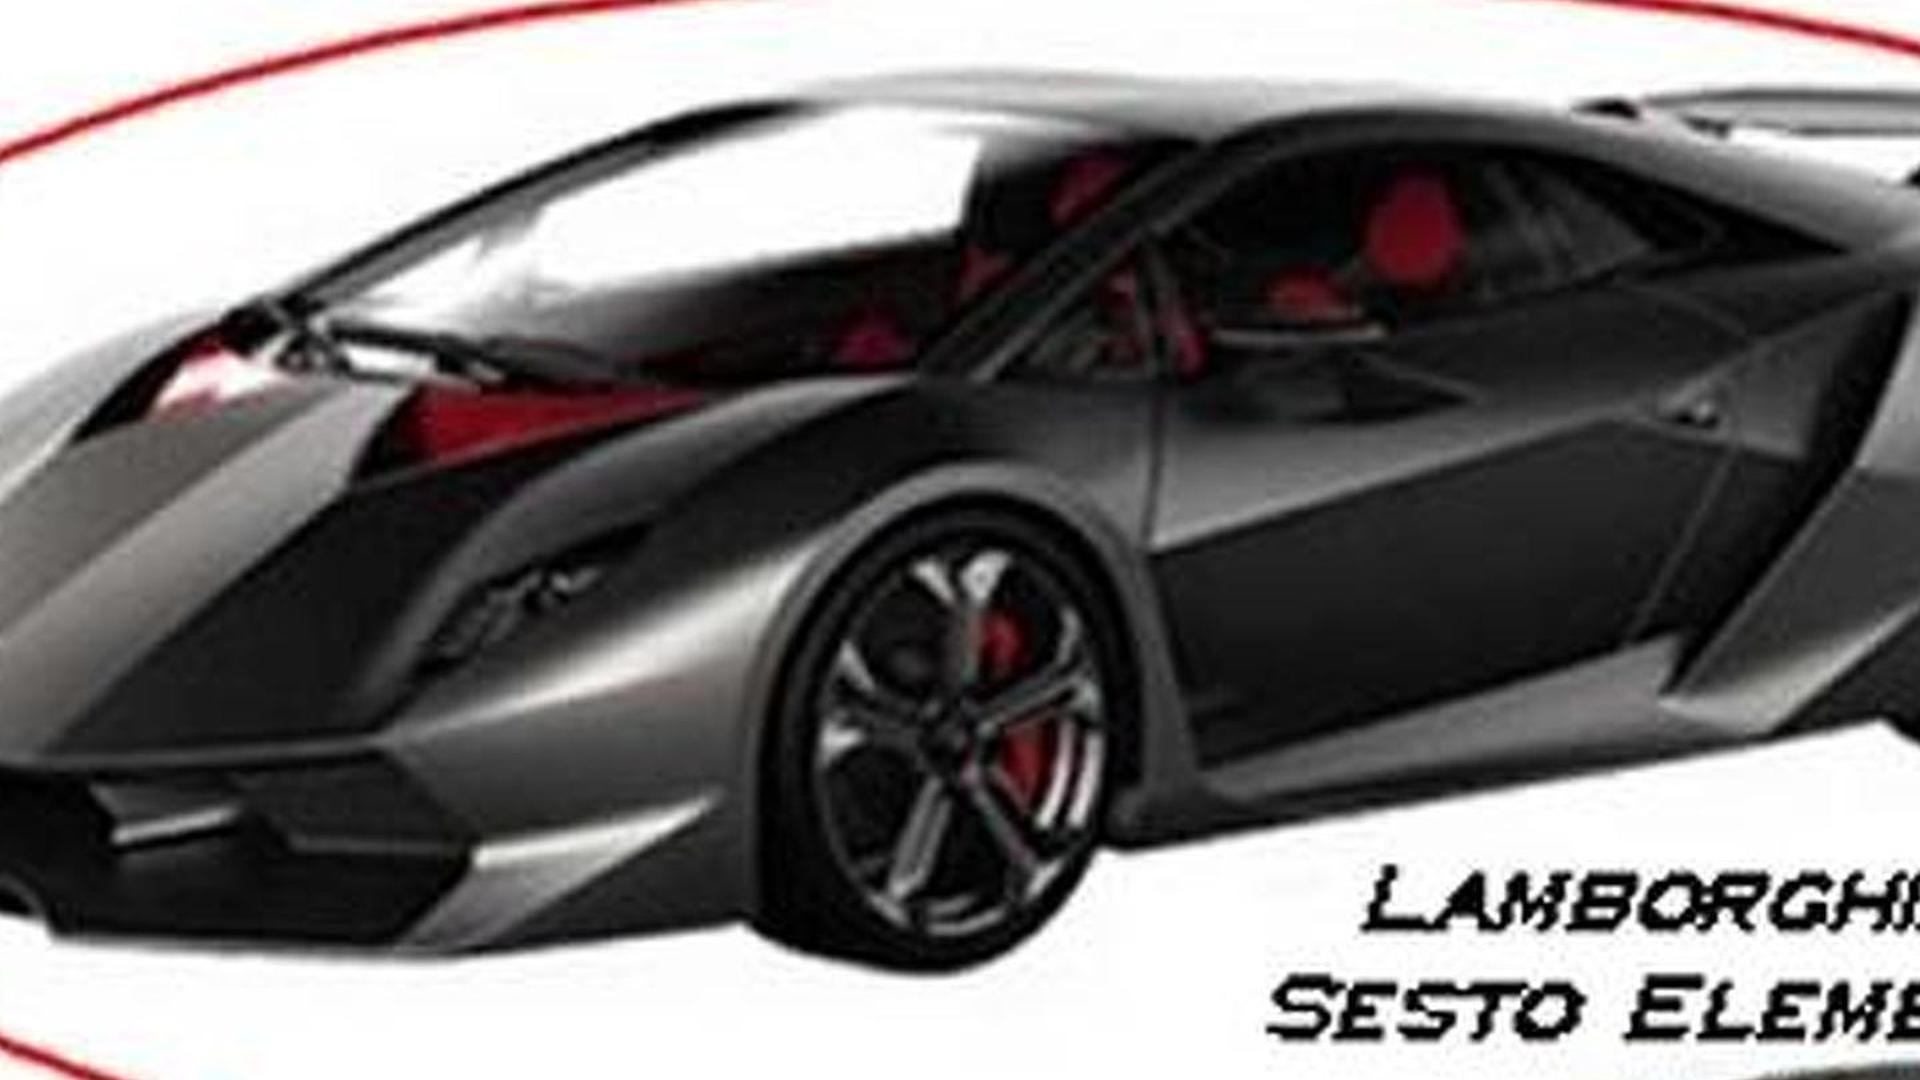 Lamborghini Sixth Element Concept LEAKED